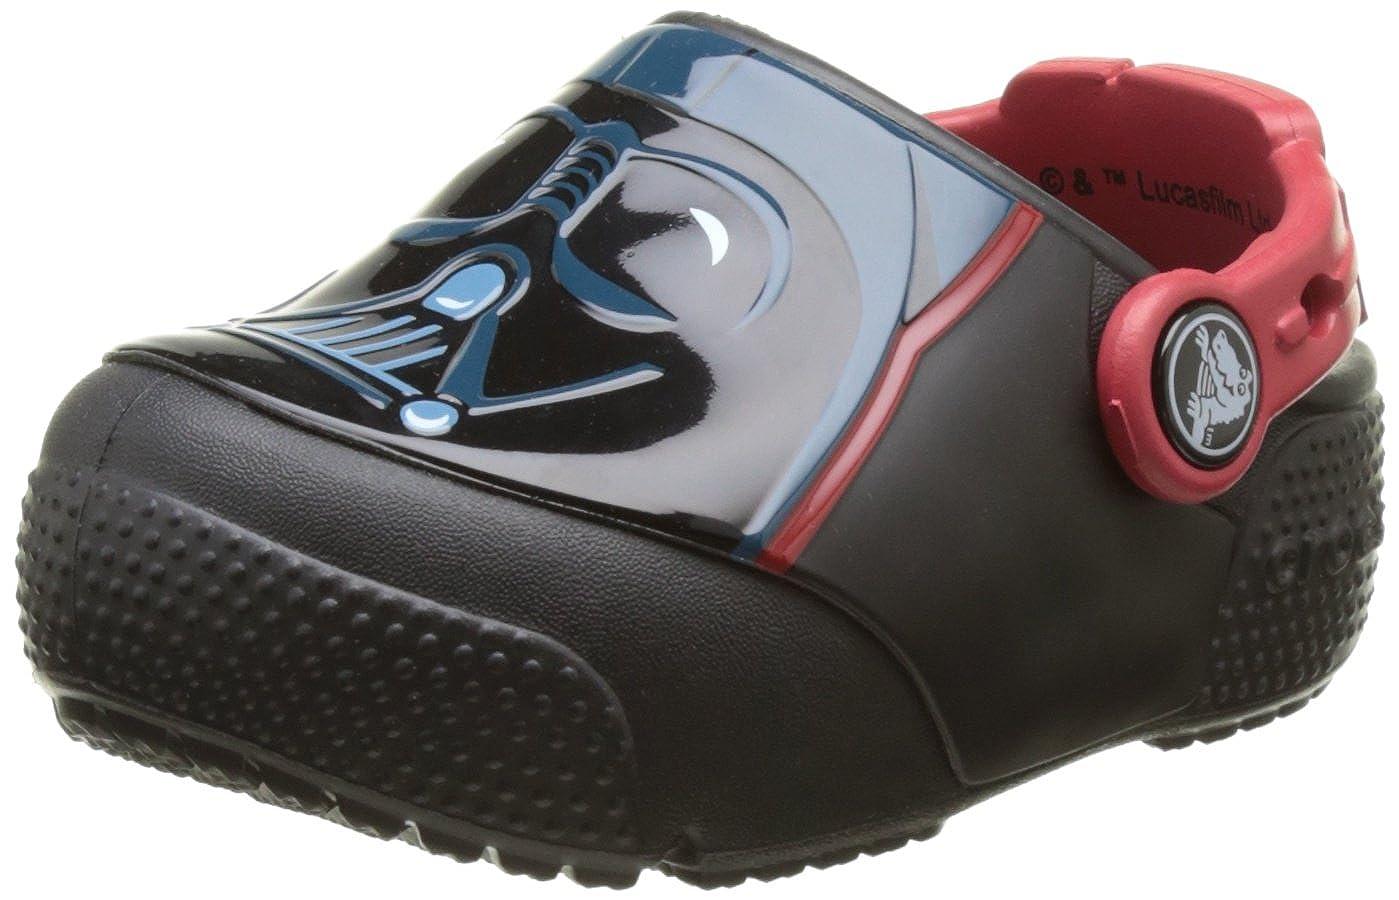 K Crocs Kids Fun Lab Light-Up Darth Vader Clog CrocsFunLab Lights Darth Vader